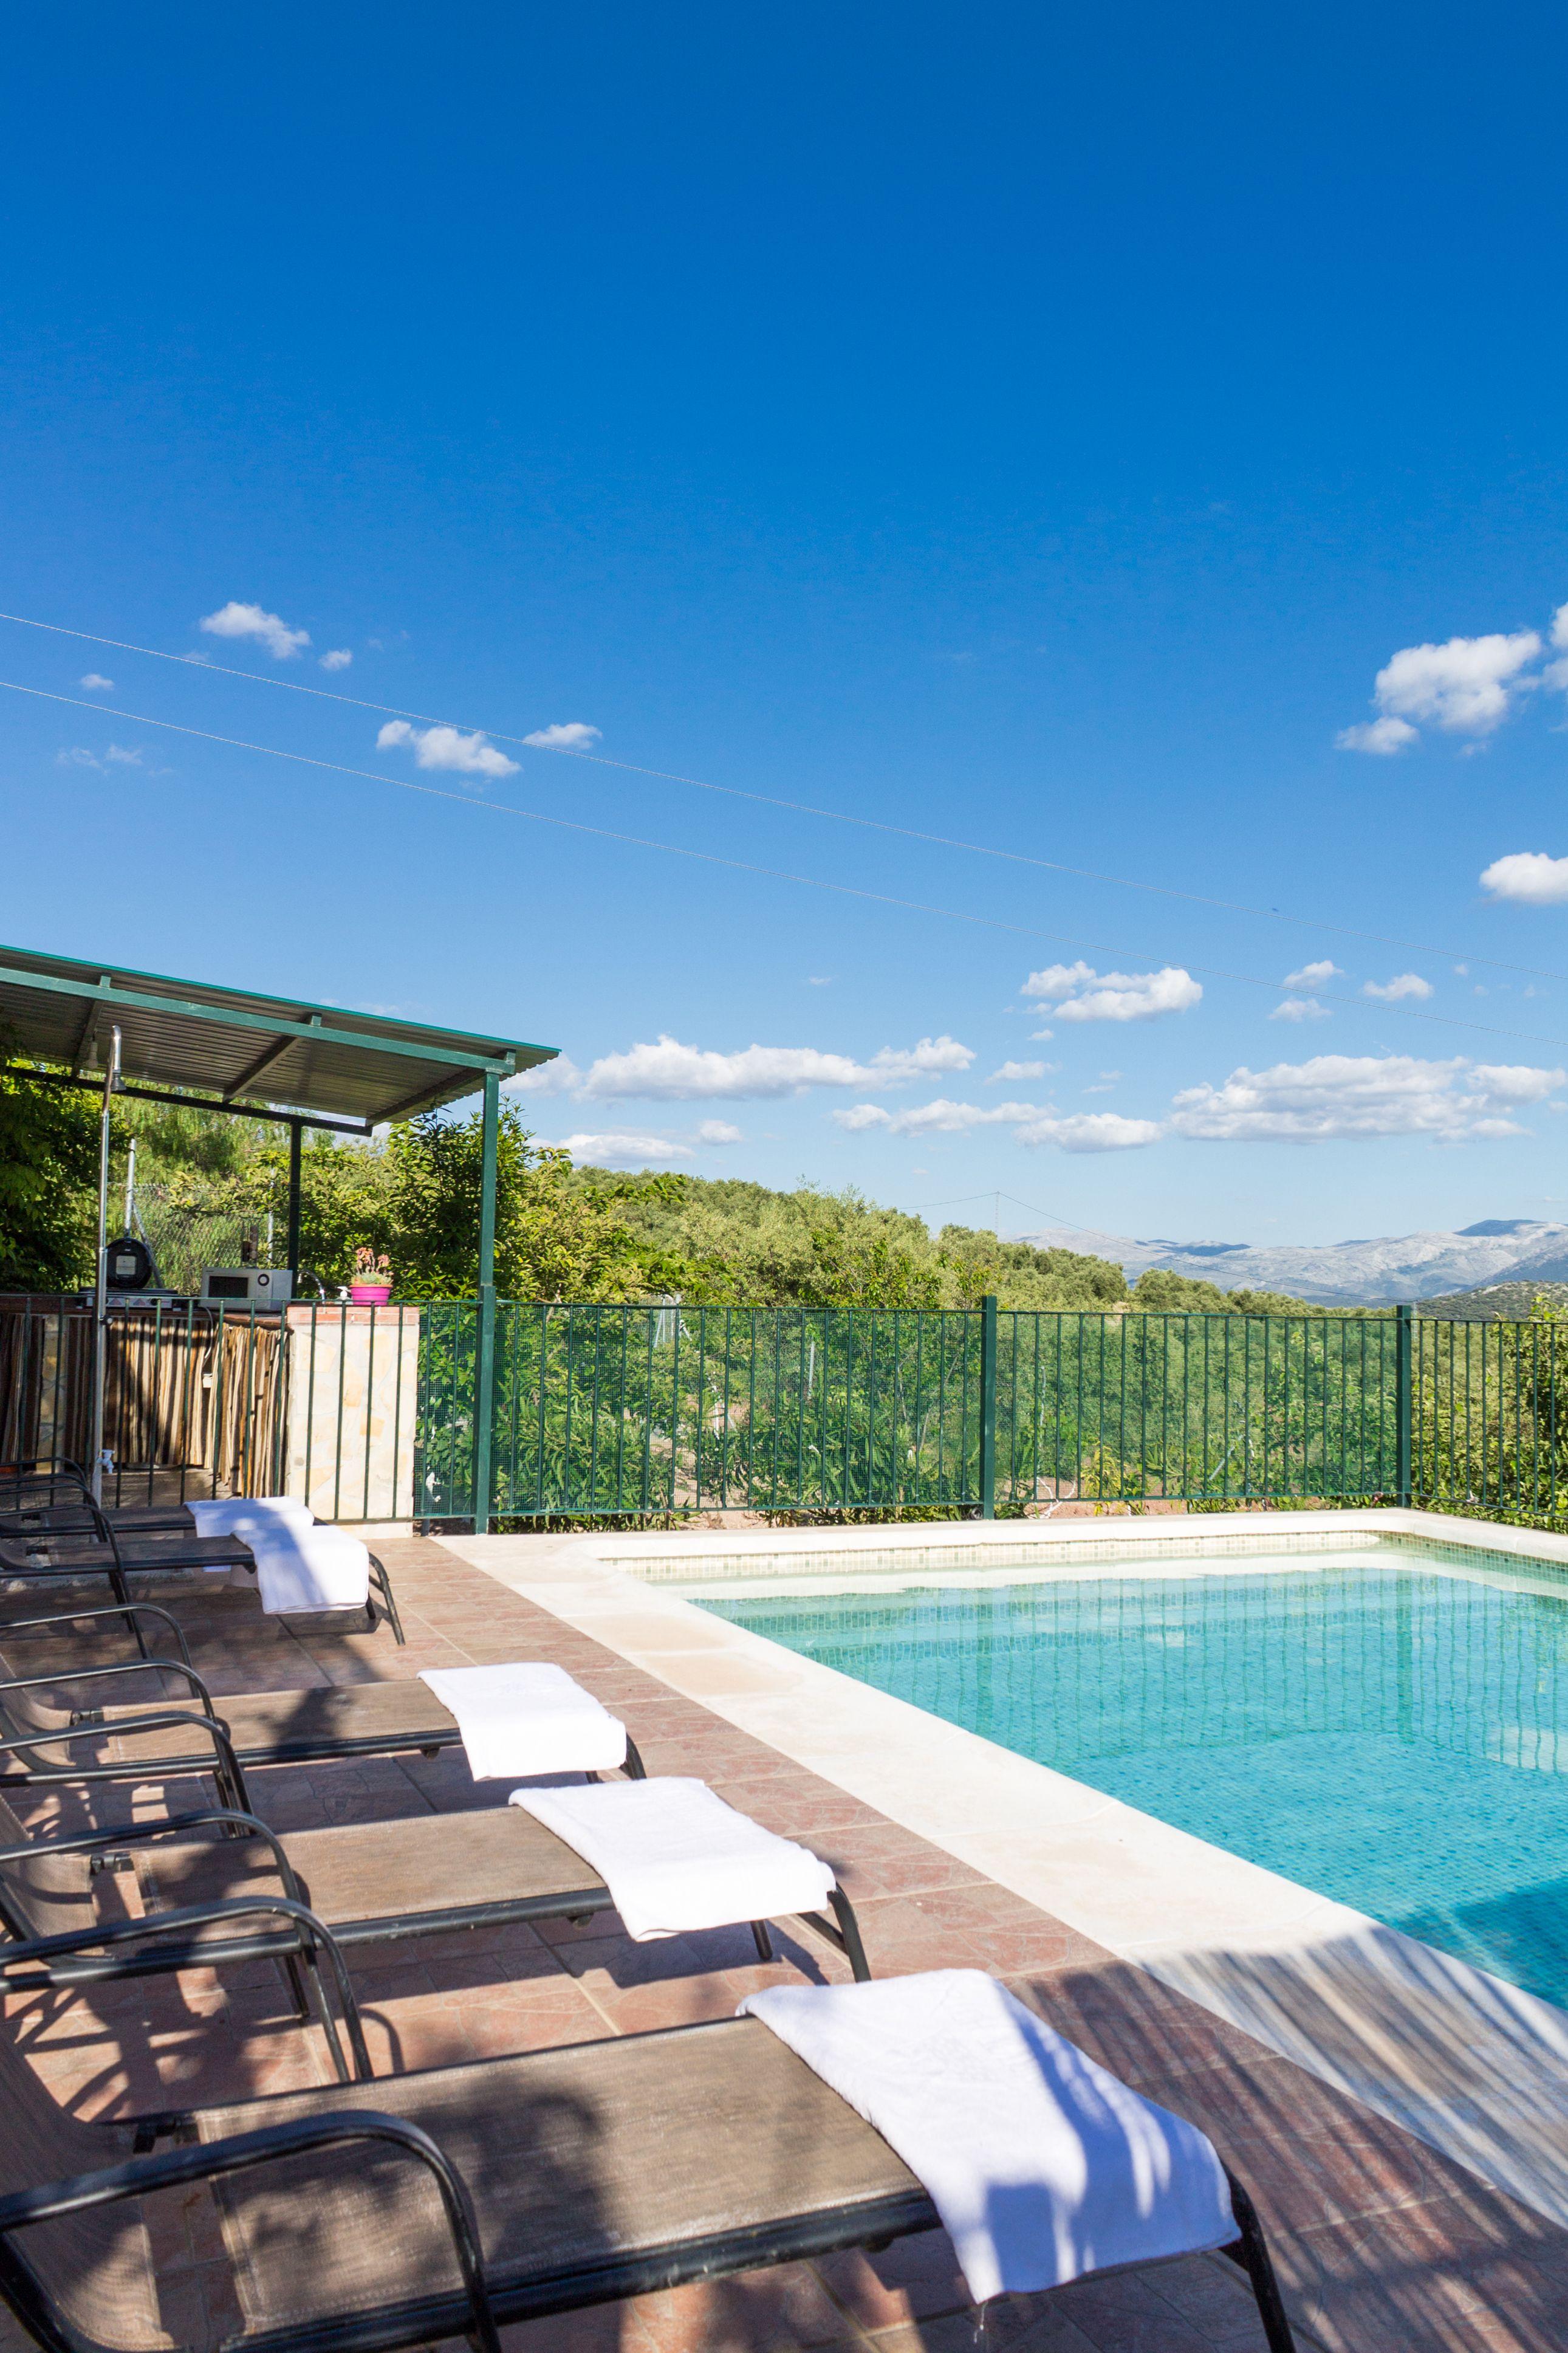 Cortijo con piscina en Málaga